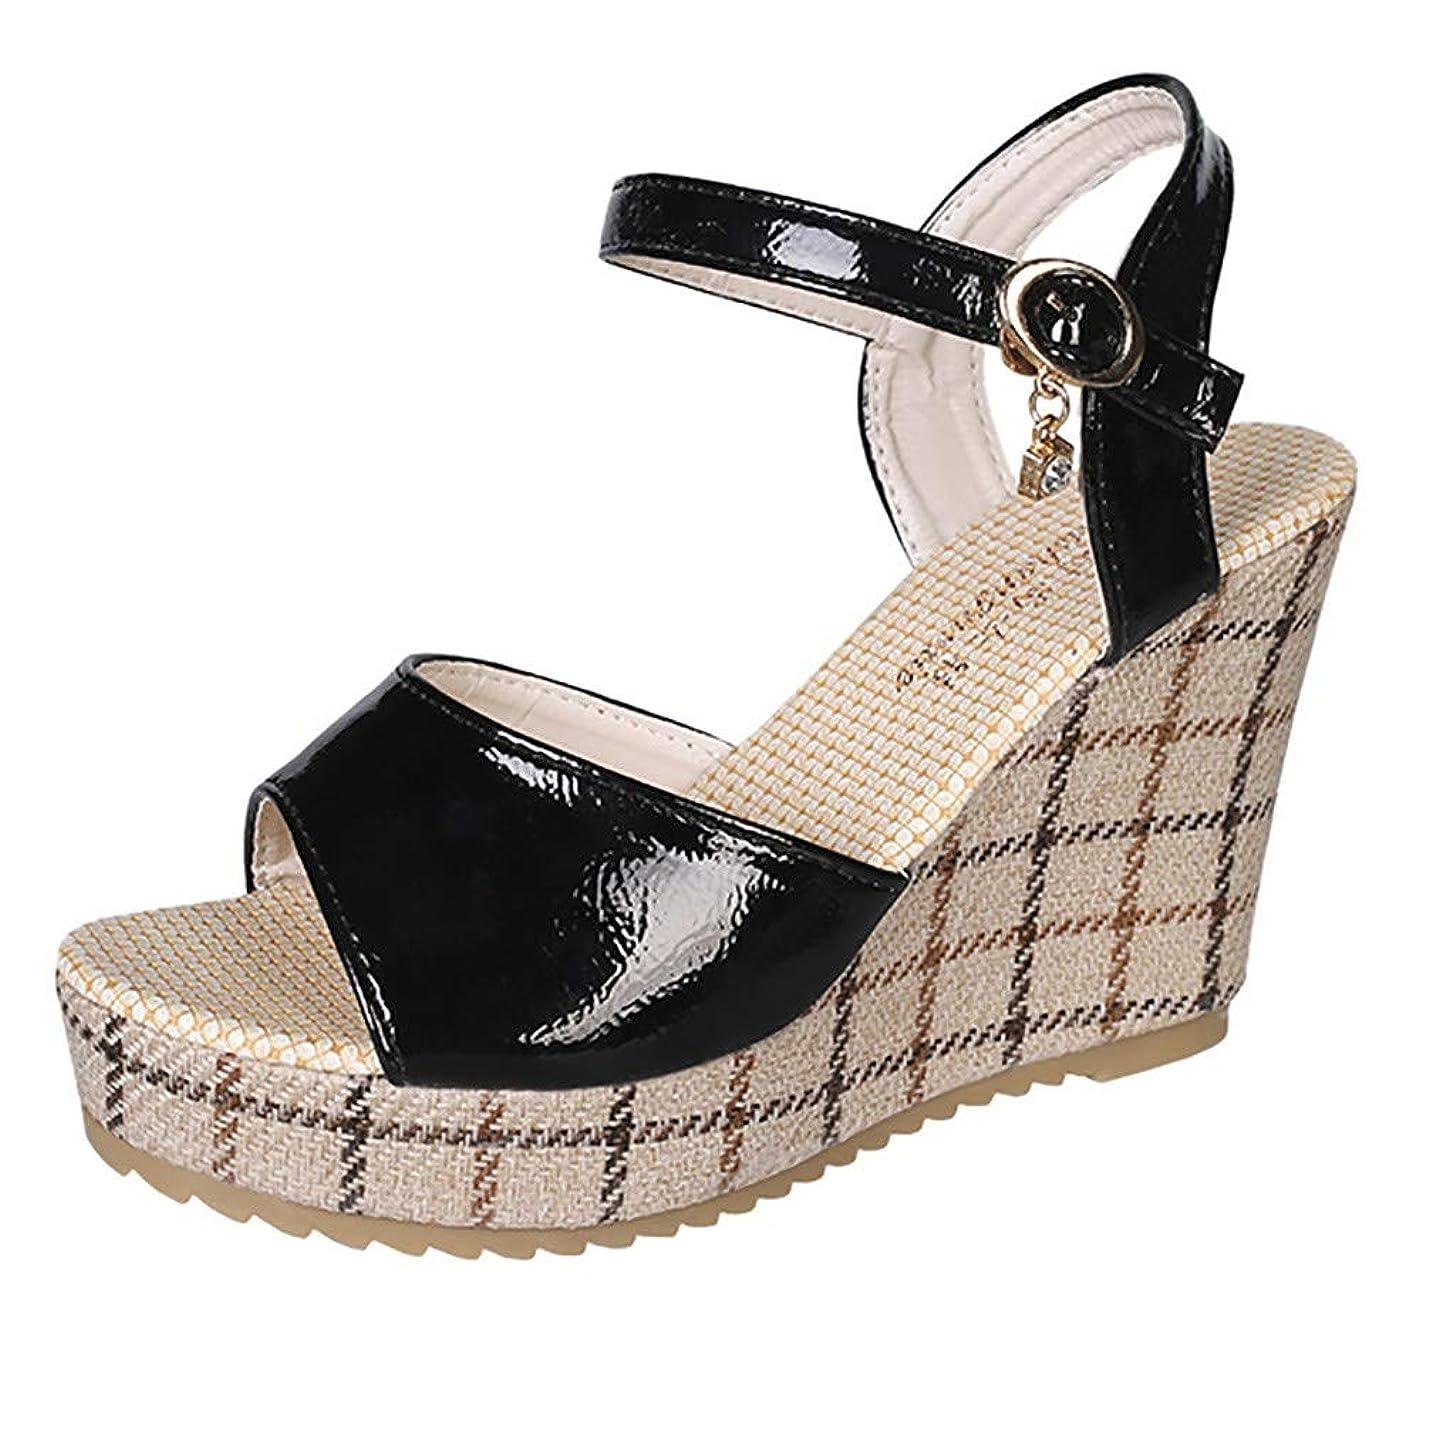 Duseedik Women's Summer Wedge Sandals Thick-Soled Sponge Cake Buckle High-Heeled Roman Outdoor Shoes